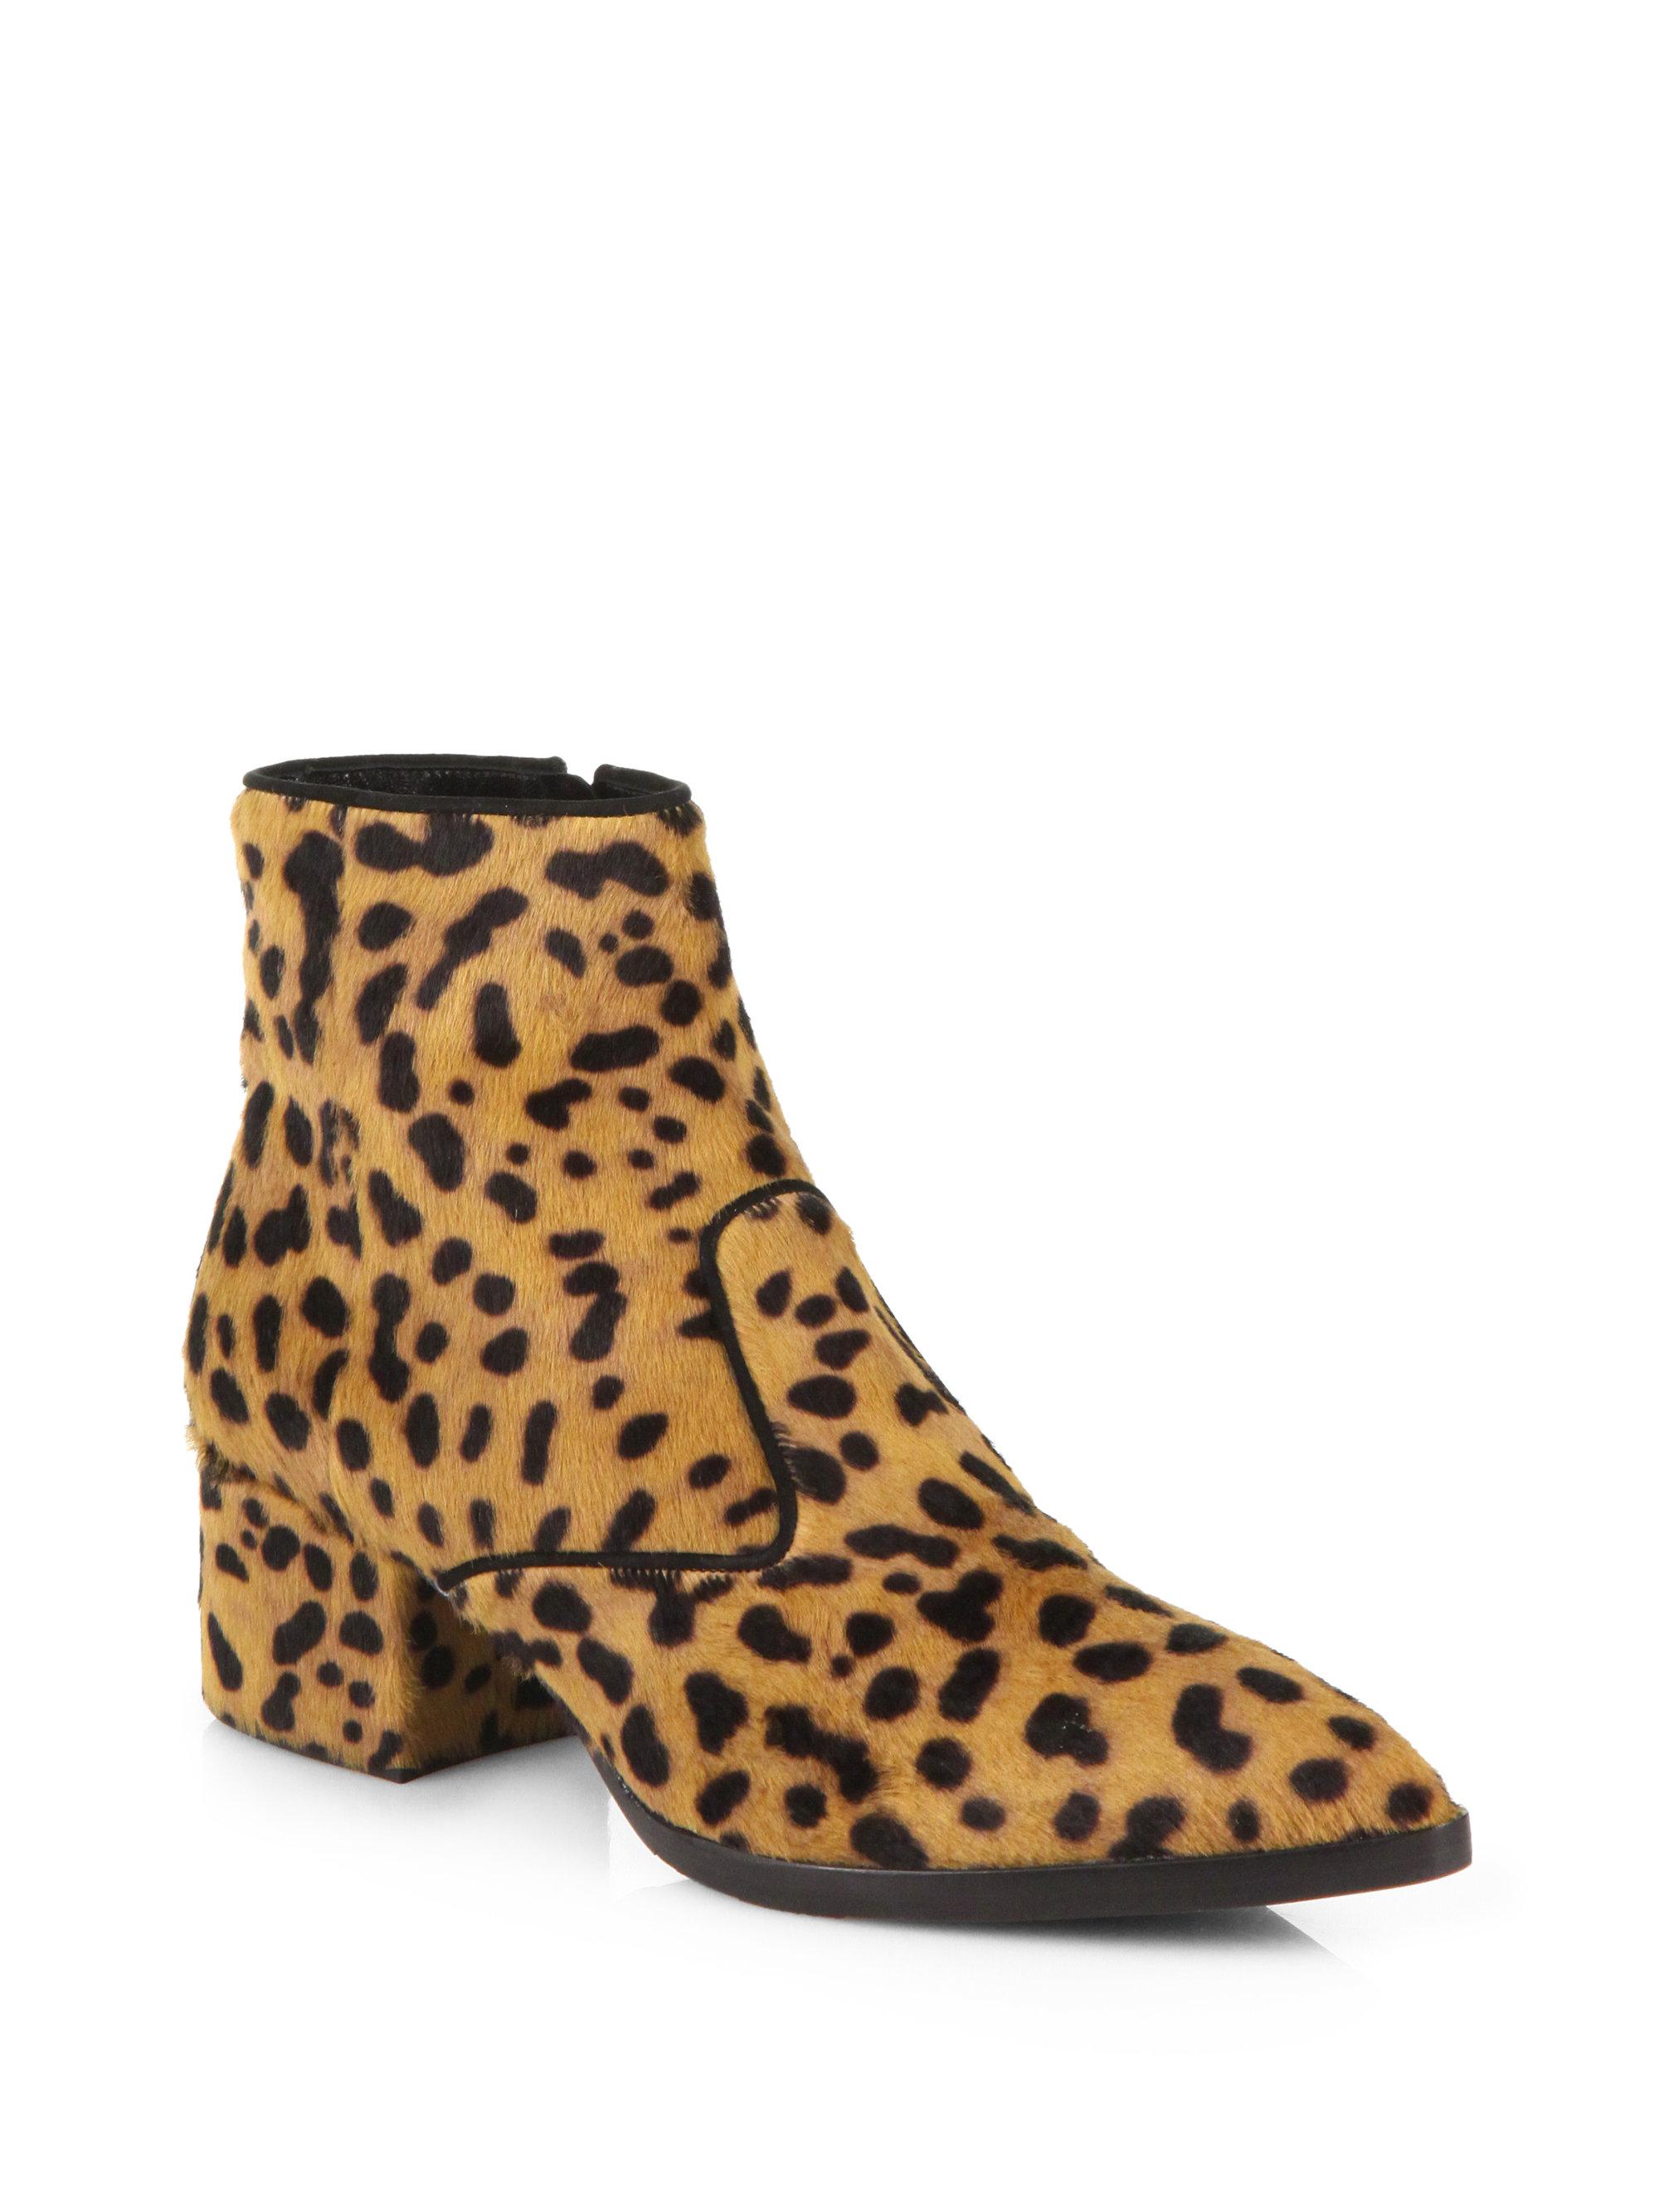 Lyst Miu Miu Animal Print Calf Hair Chelsea Boots In Brown